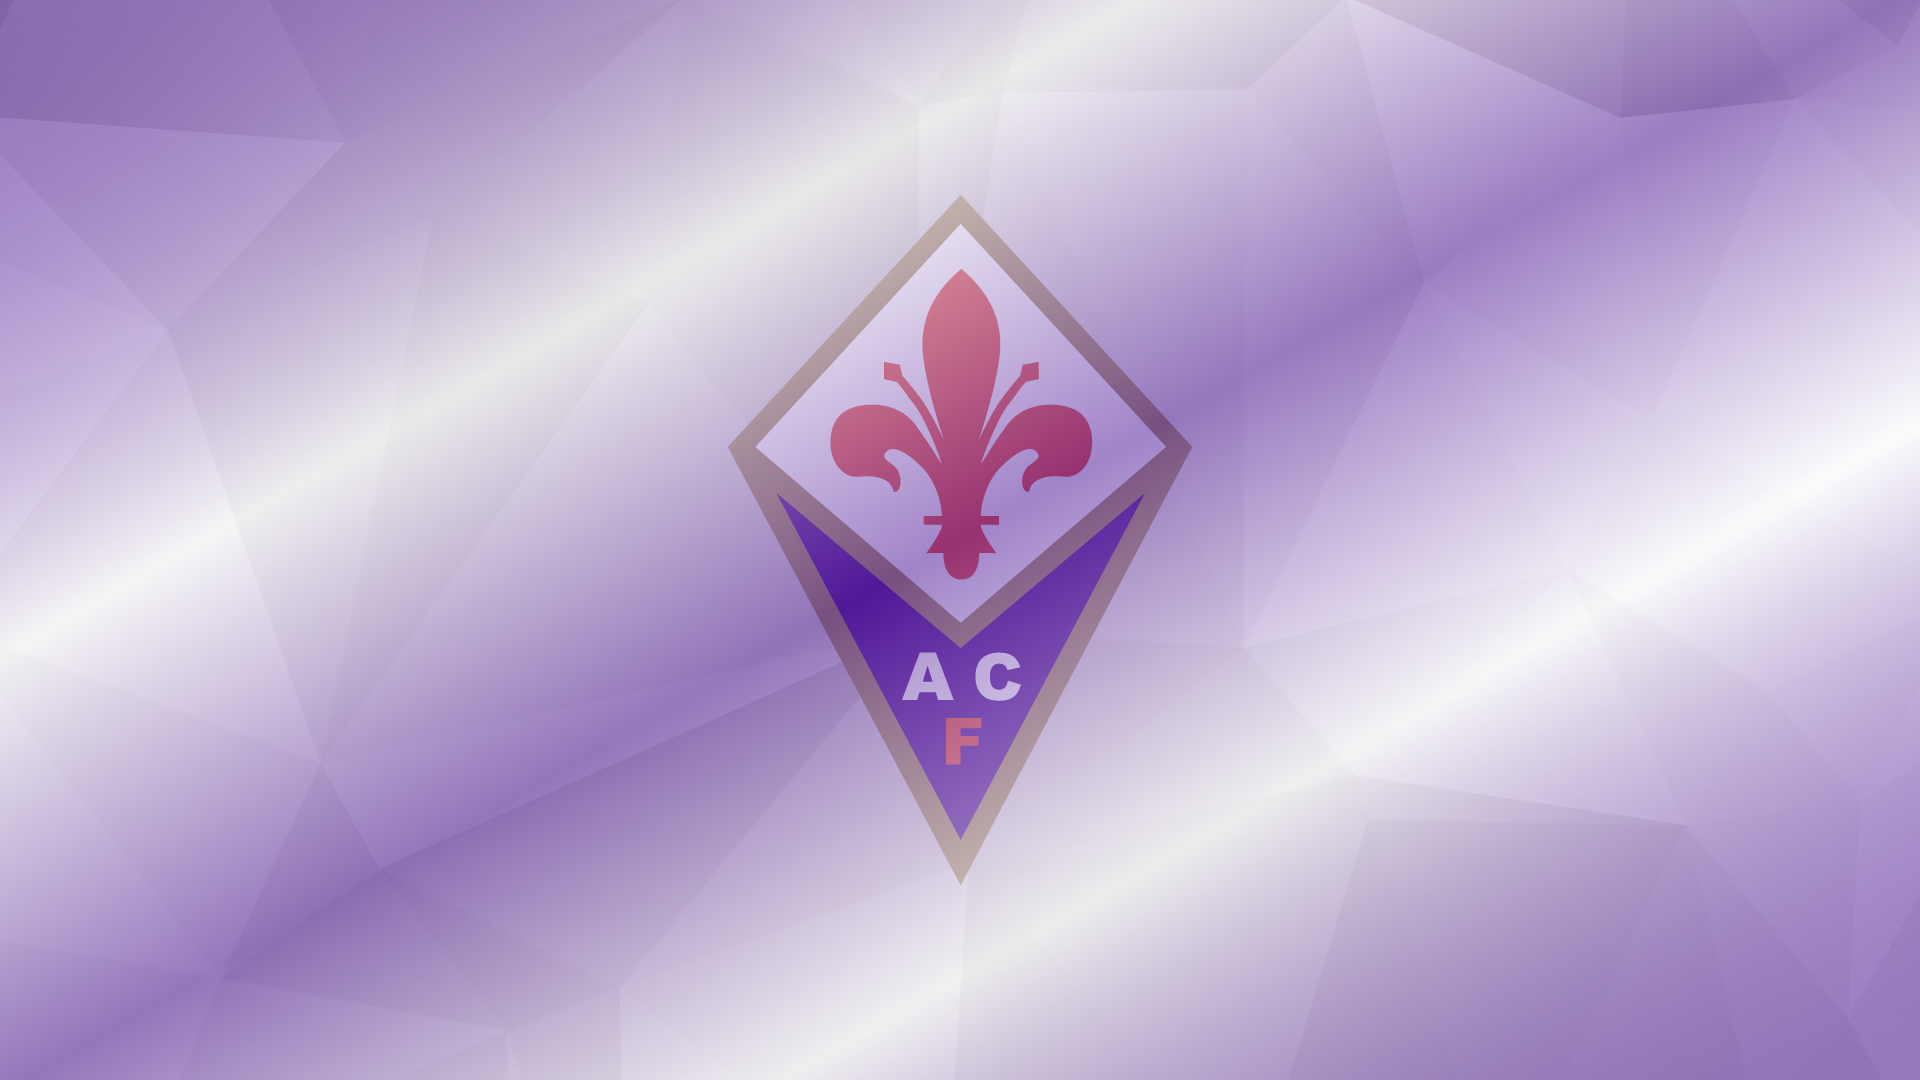 Campagna abbonamenti Fiorentina